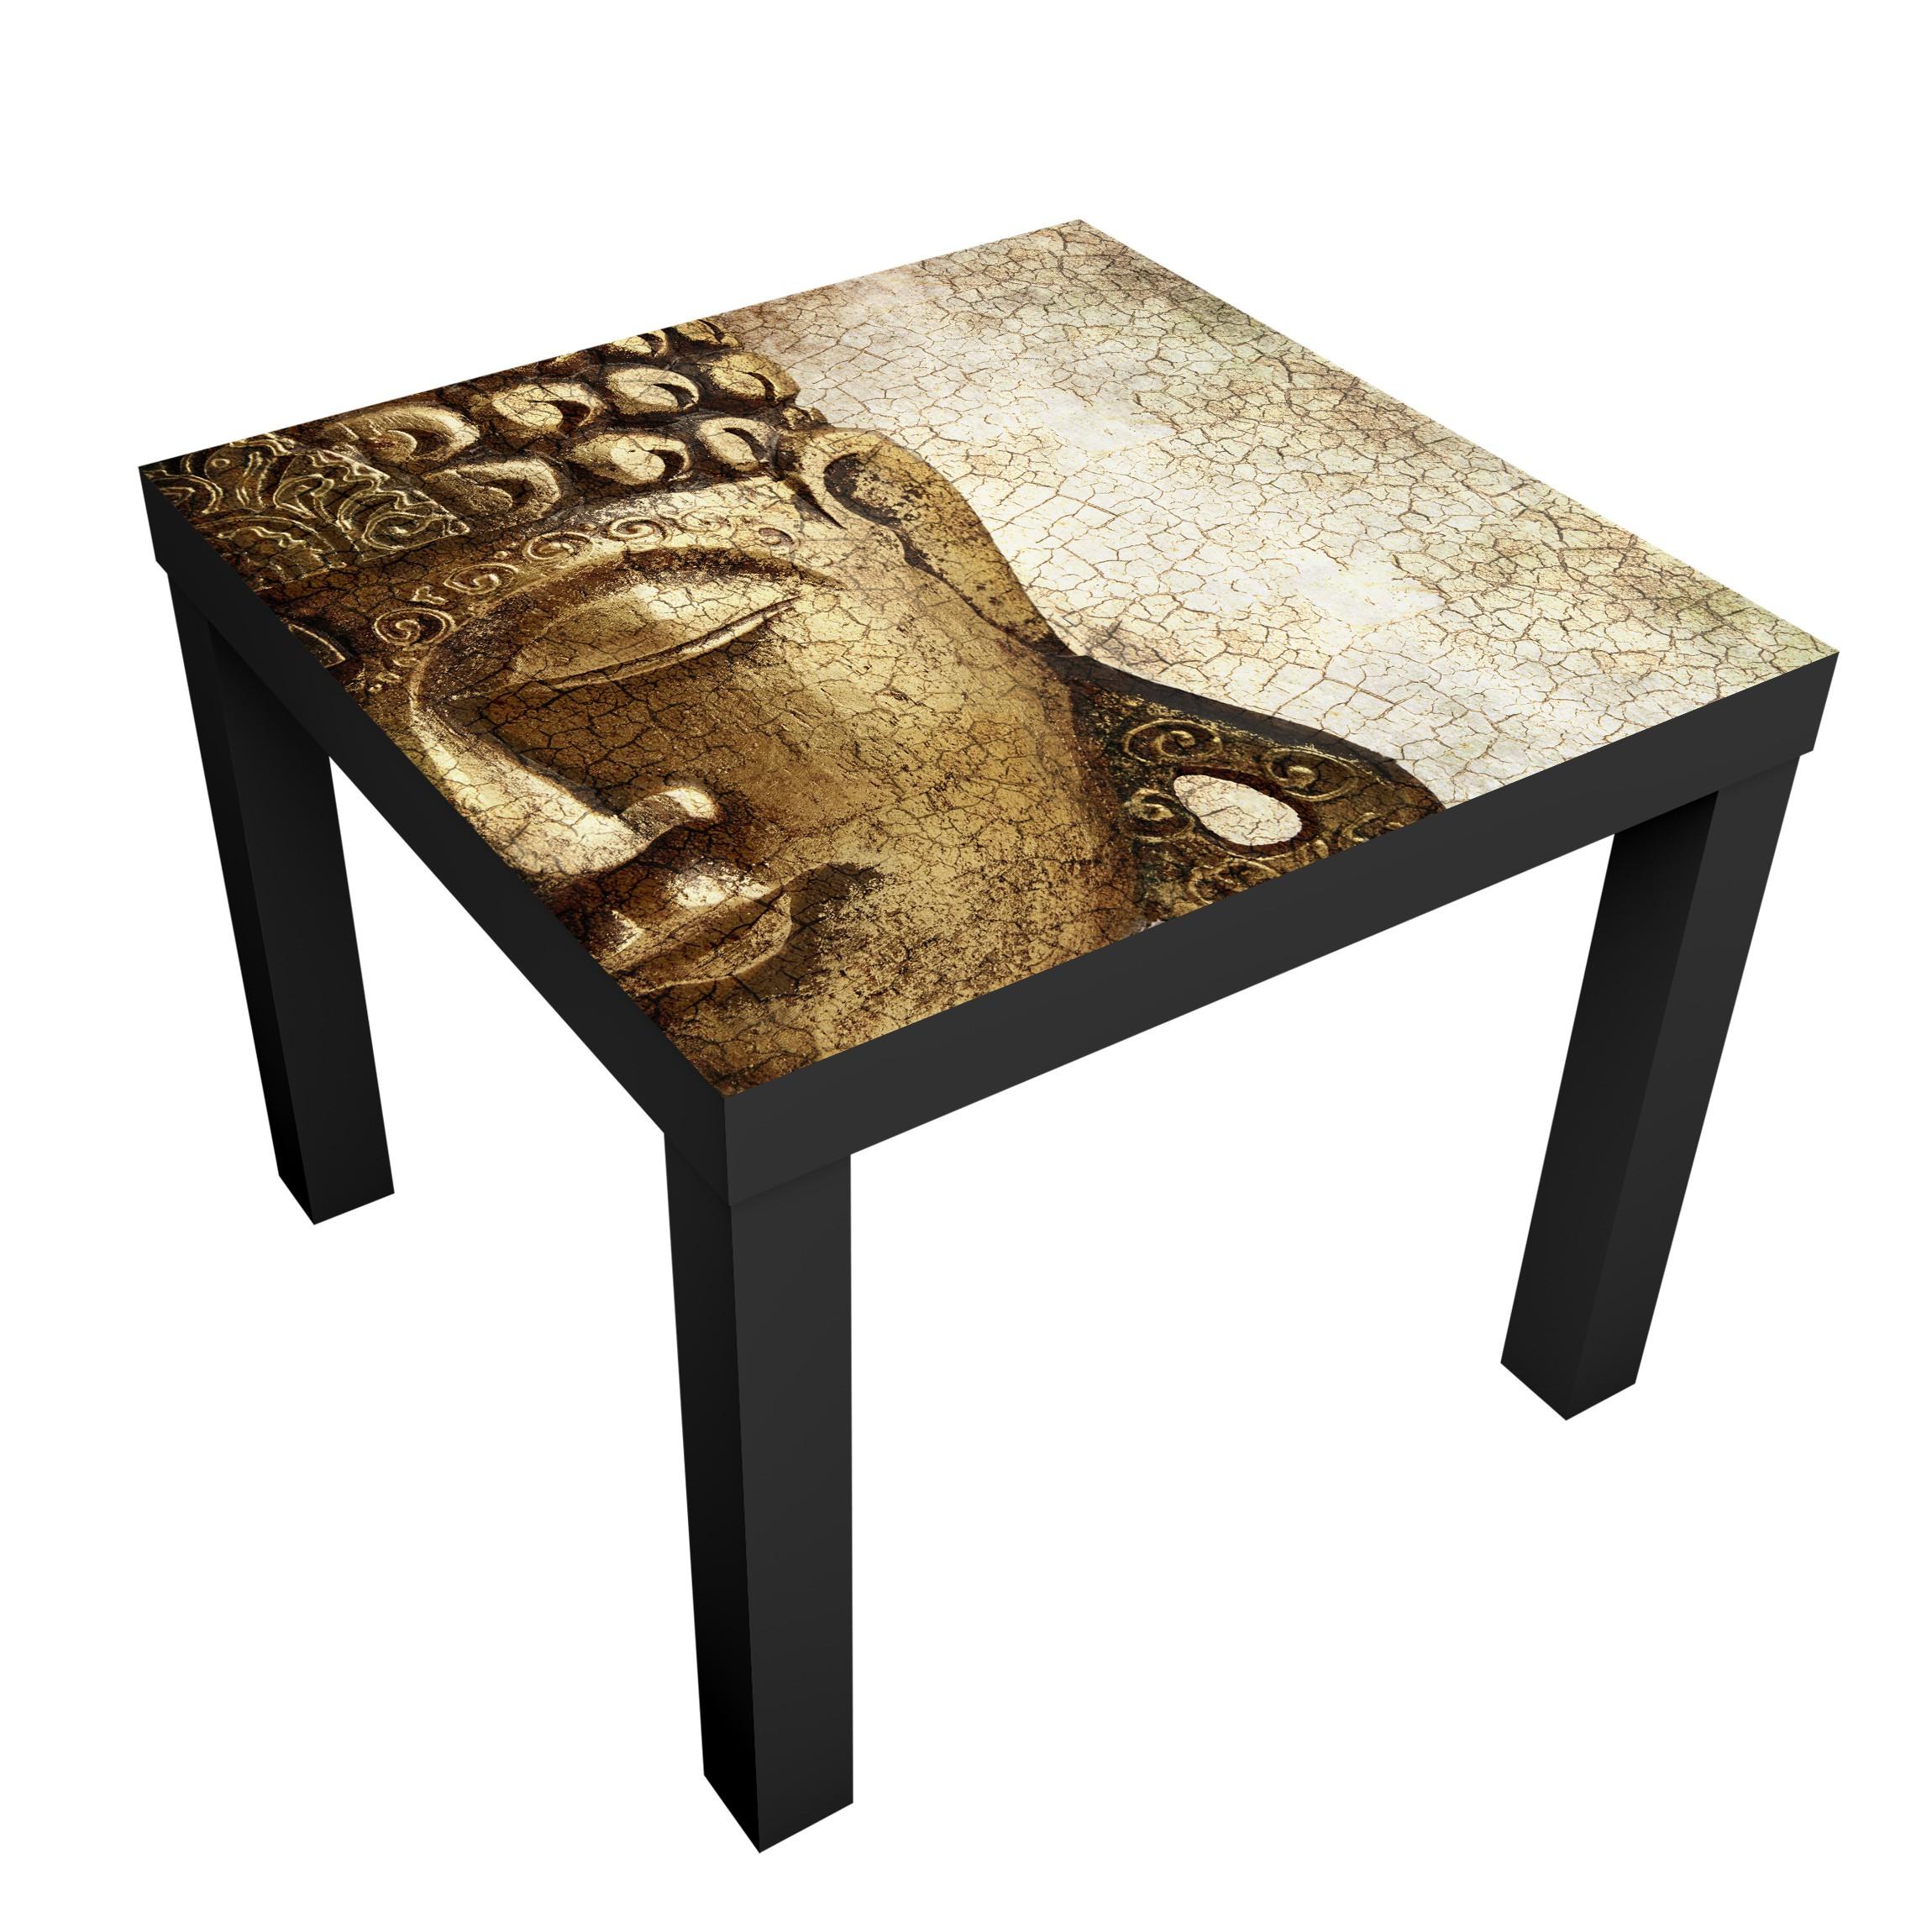 Carta adesiva per mobili ikea lack tavolino vintage buddha - Carte adesive per mobili ...